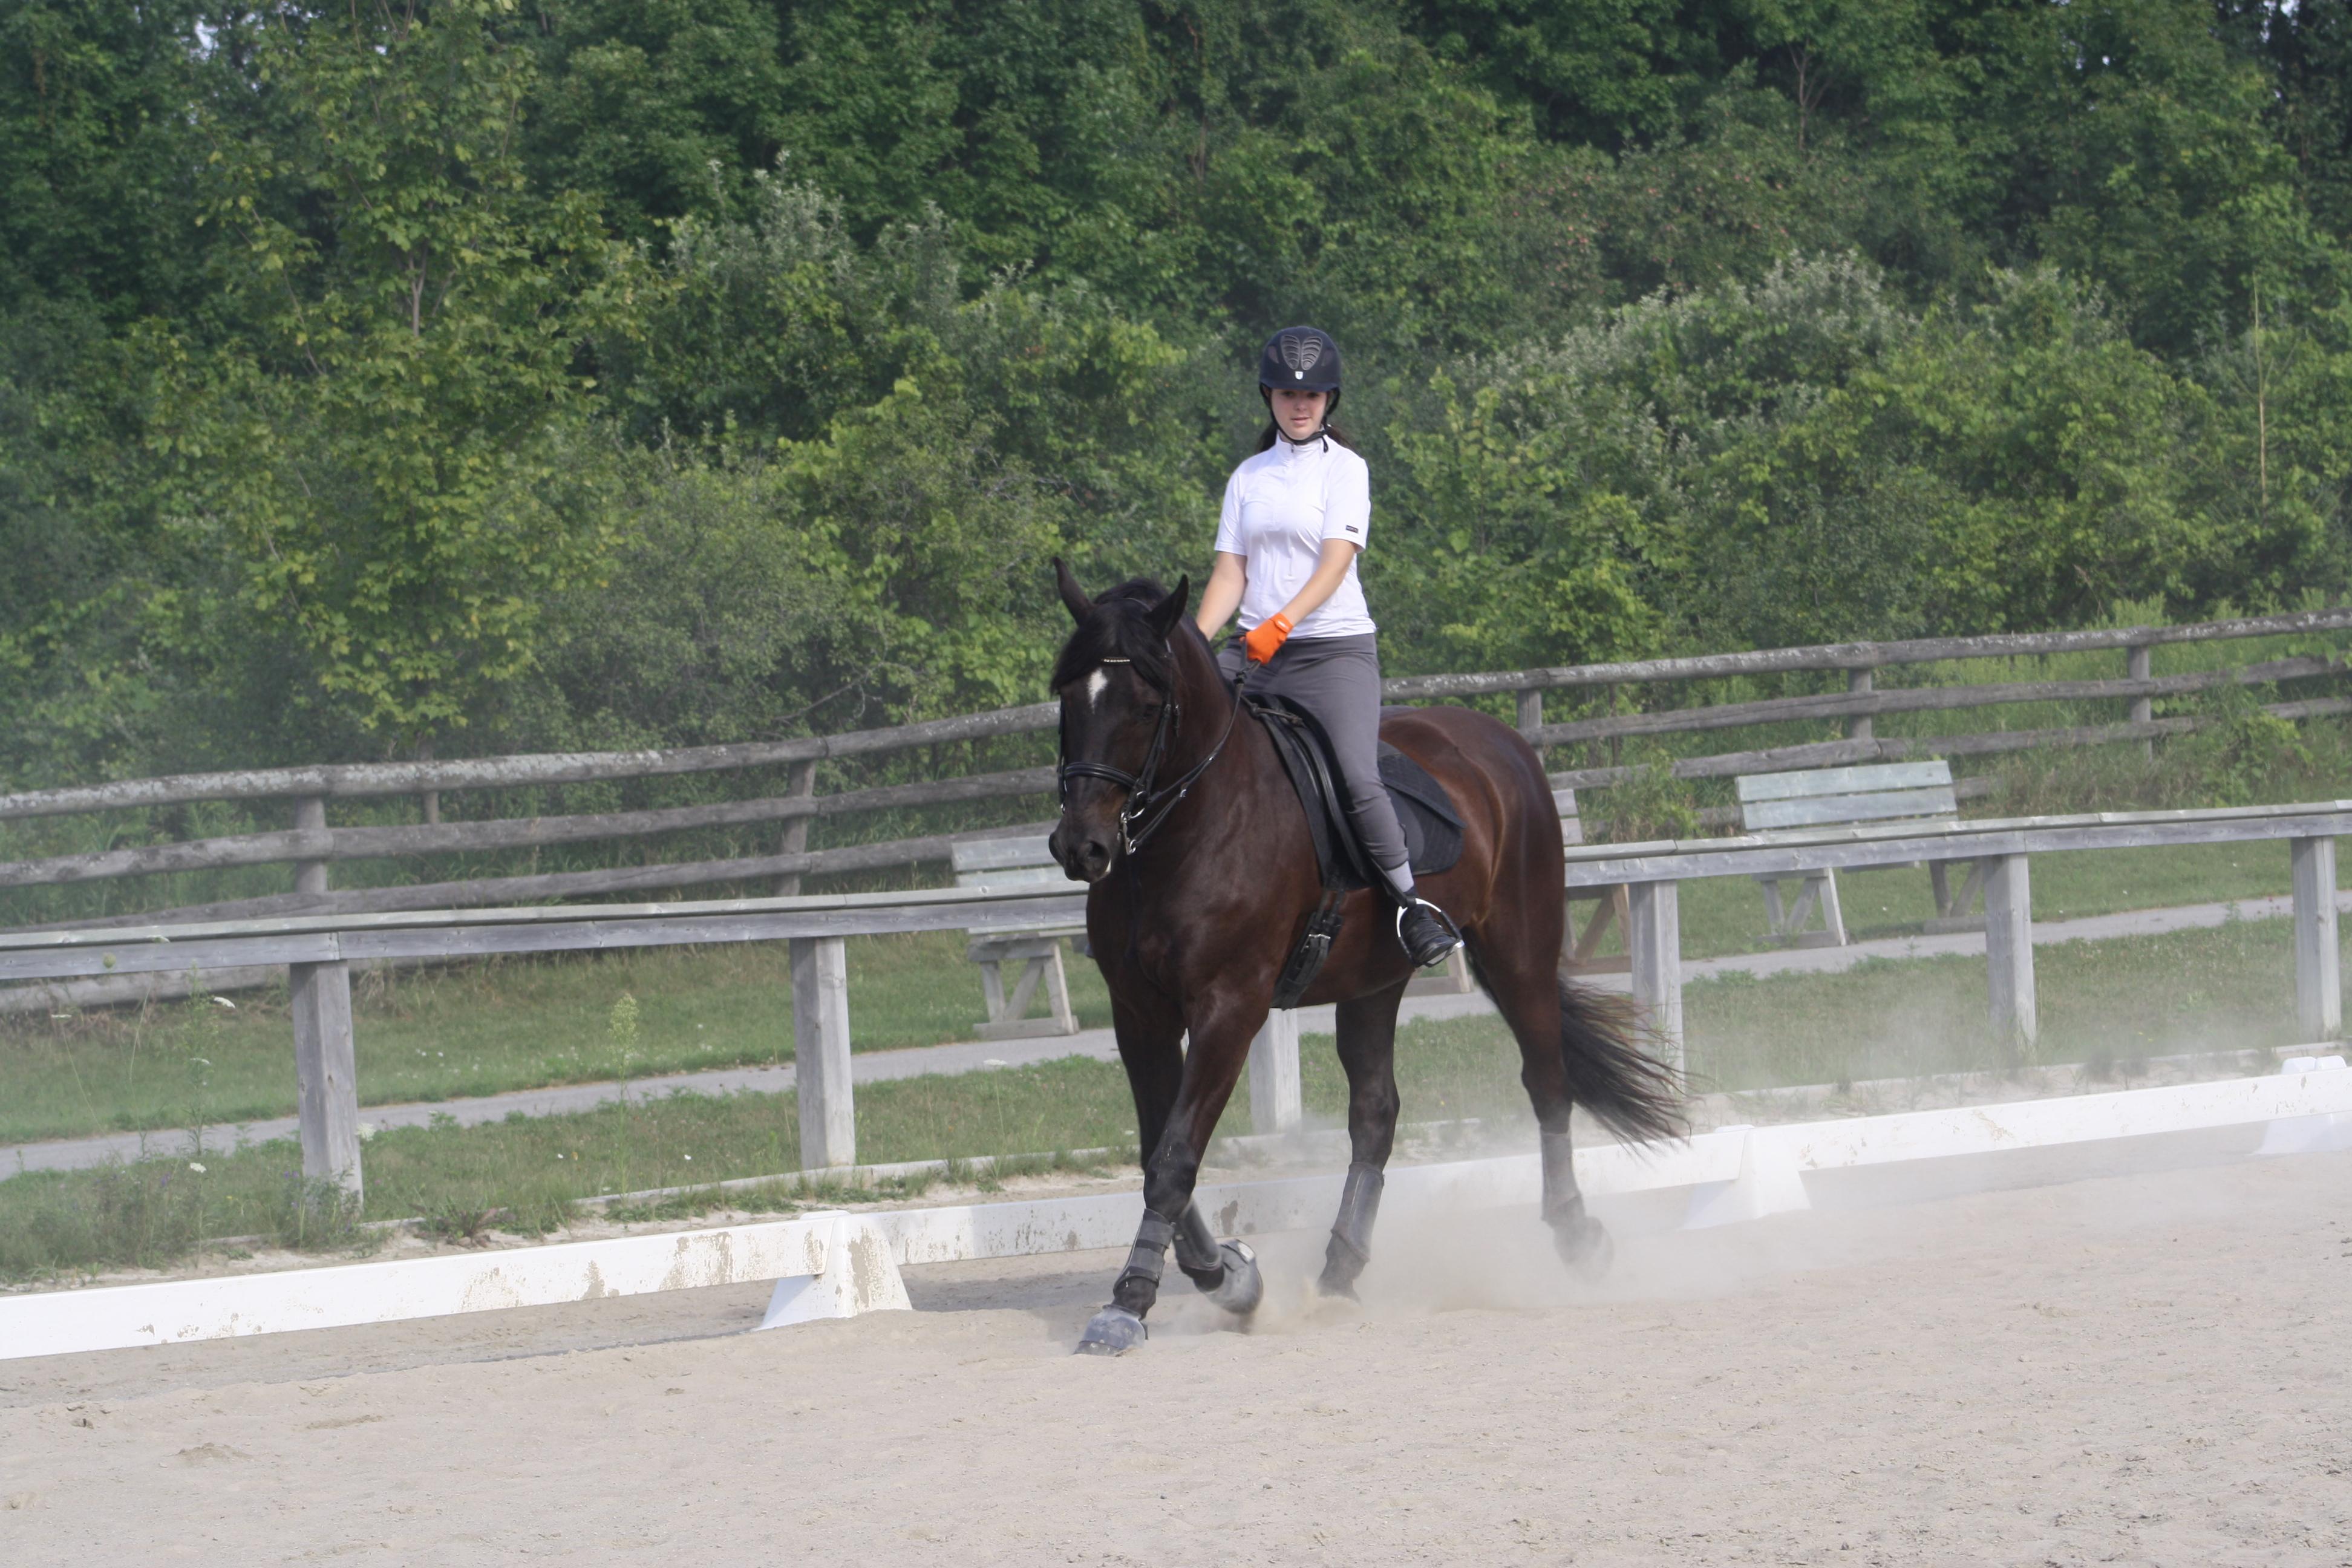 Amanda riding a horse